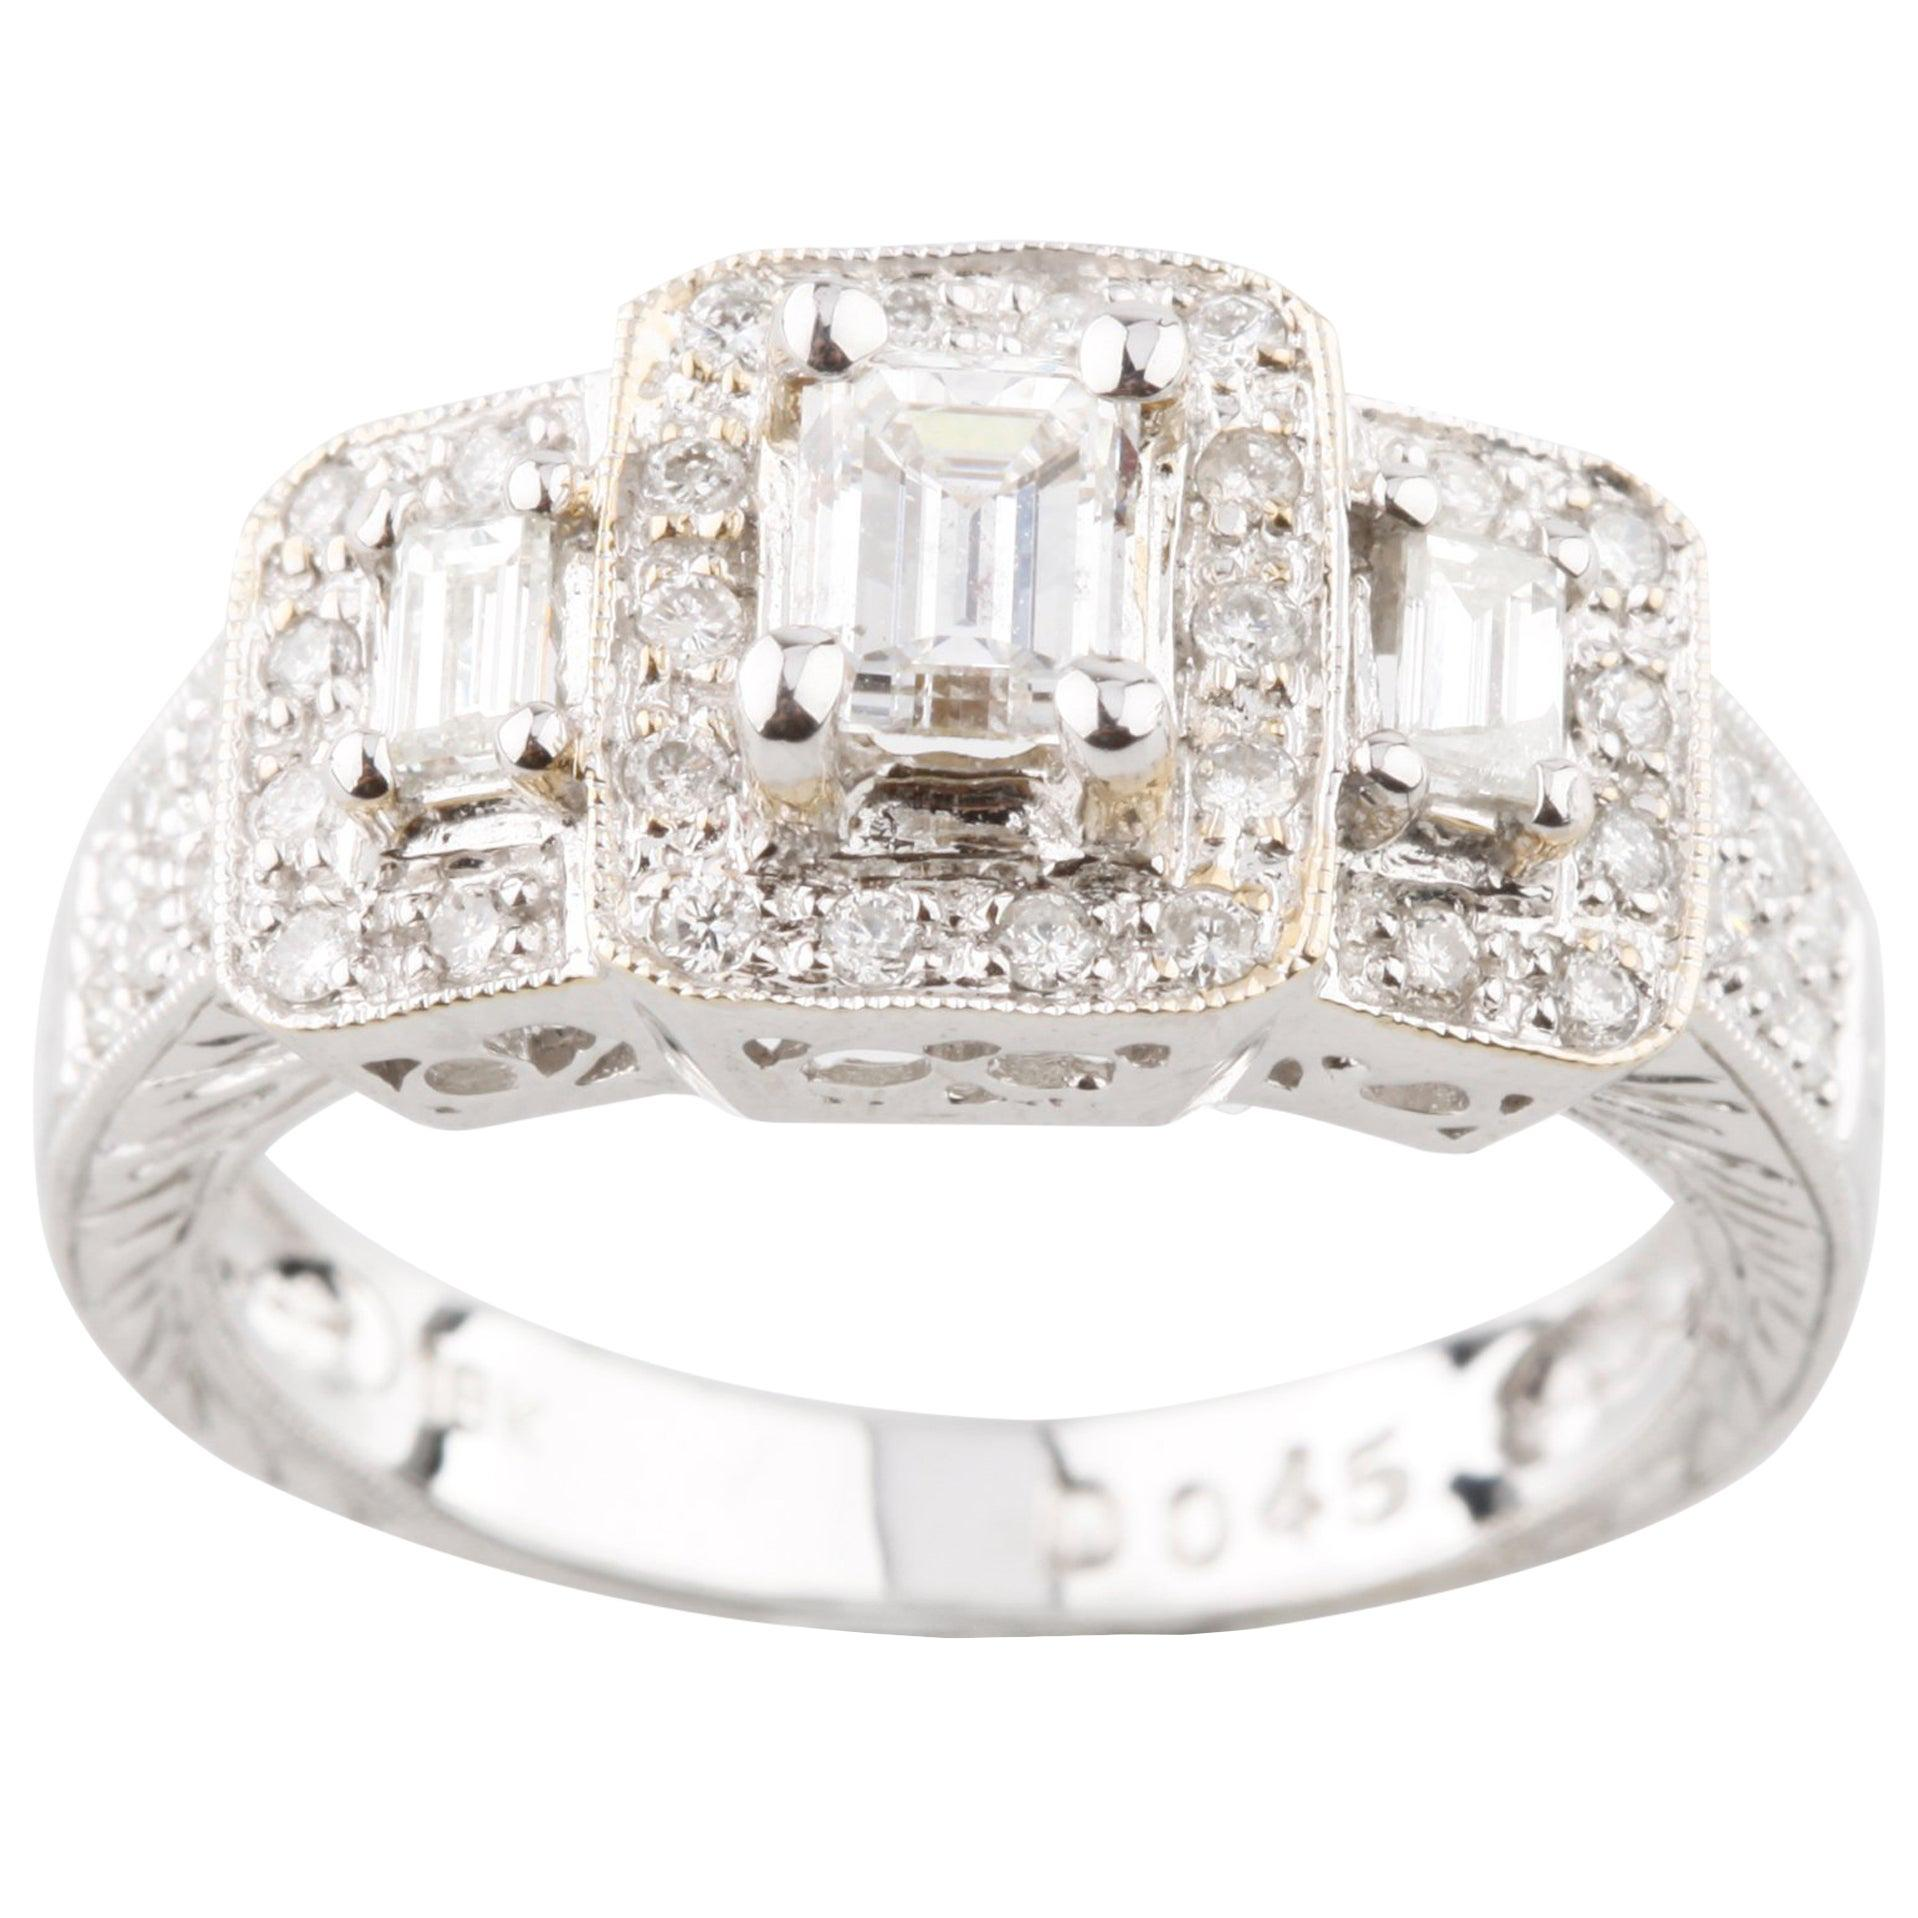 0.95 Carat 3-Stone Emerald Cut Diamond 18 Karat White Gold Engagement Ring